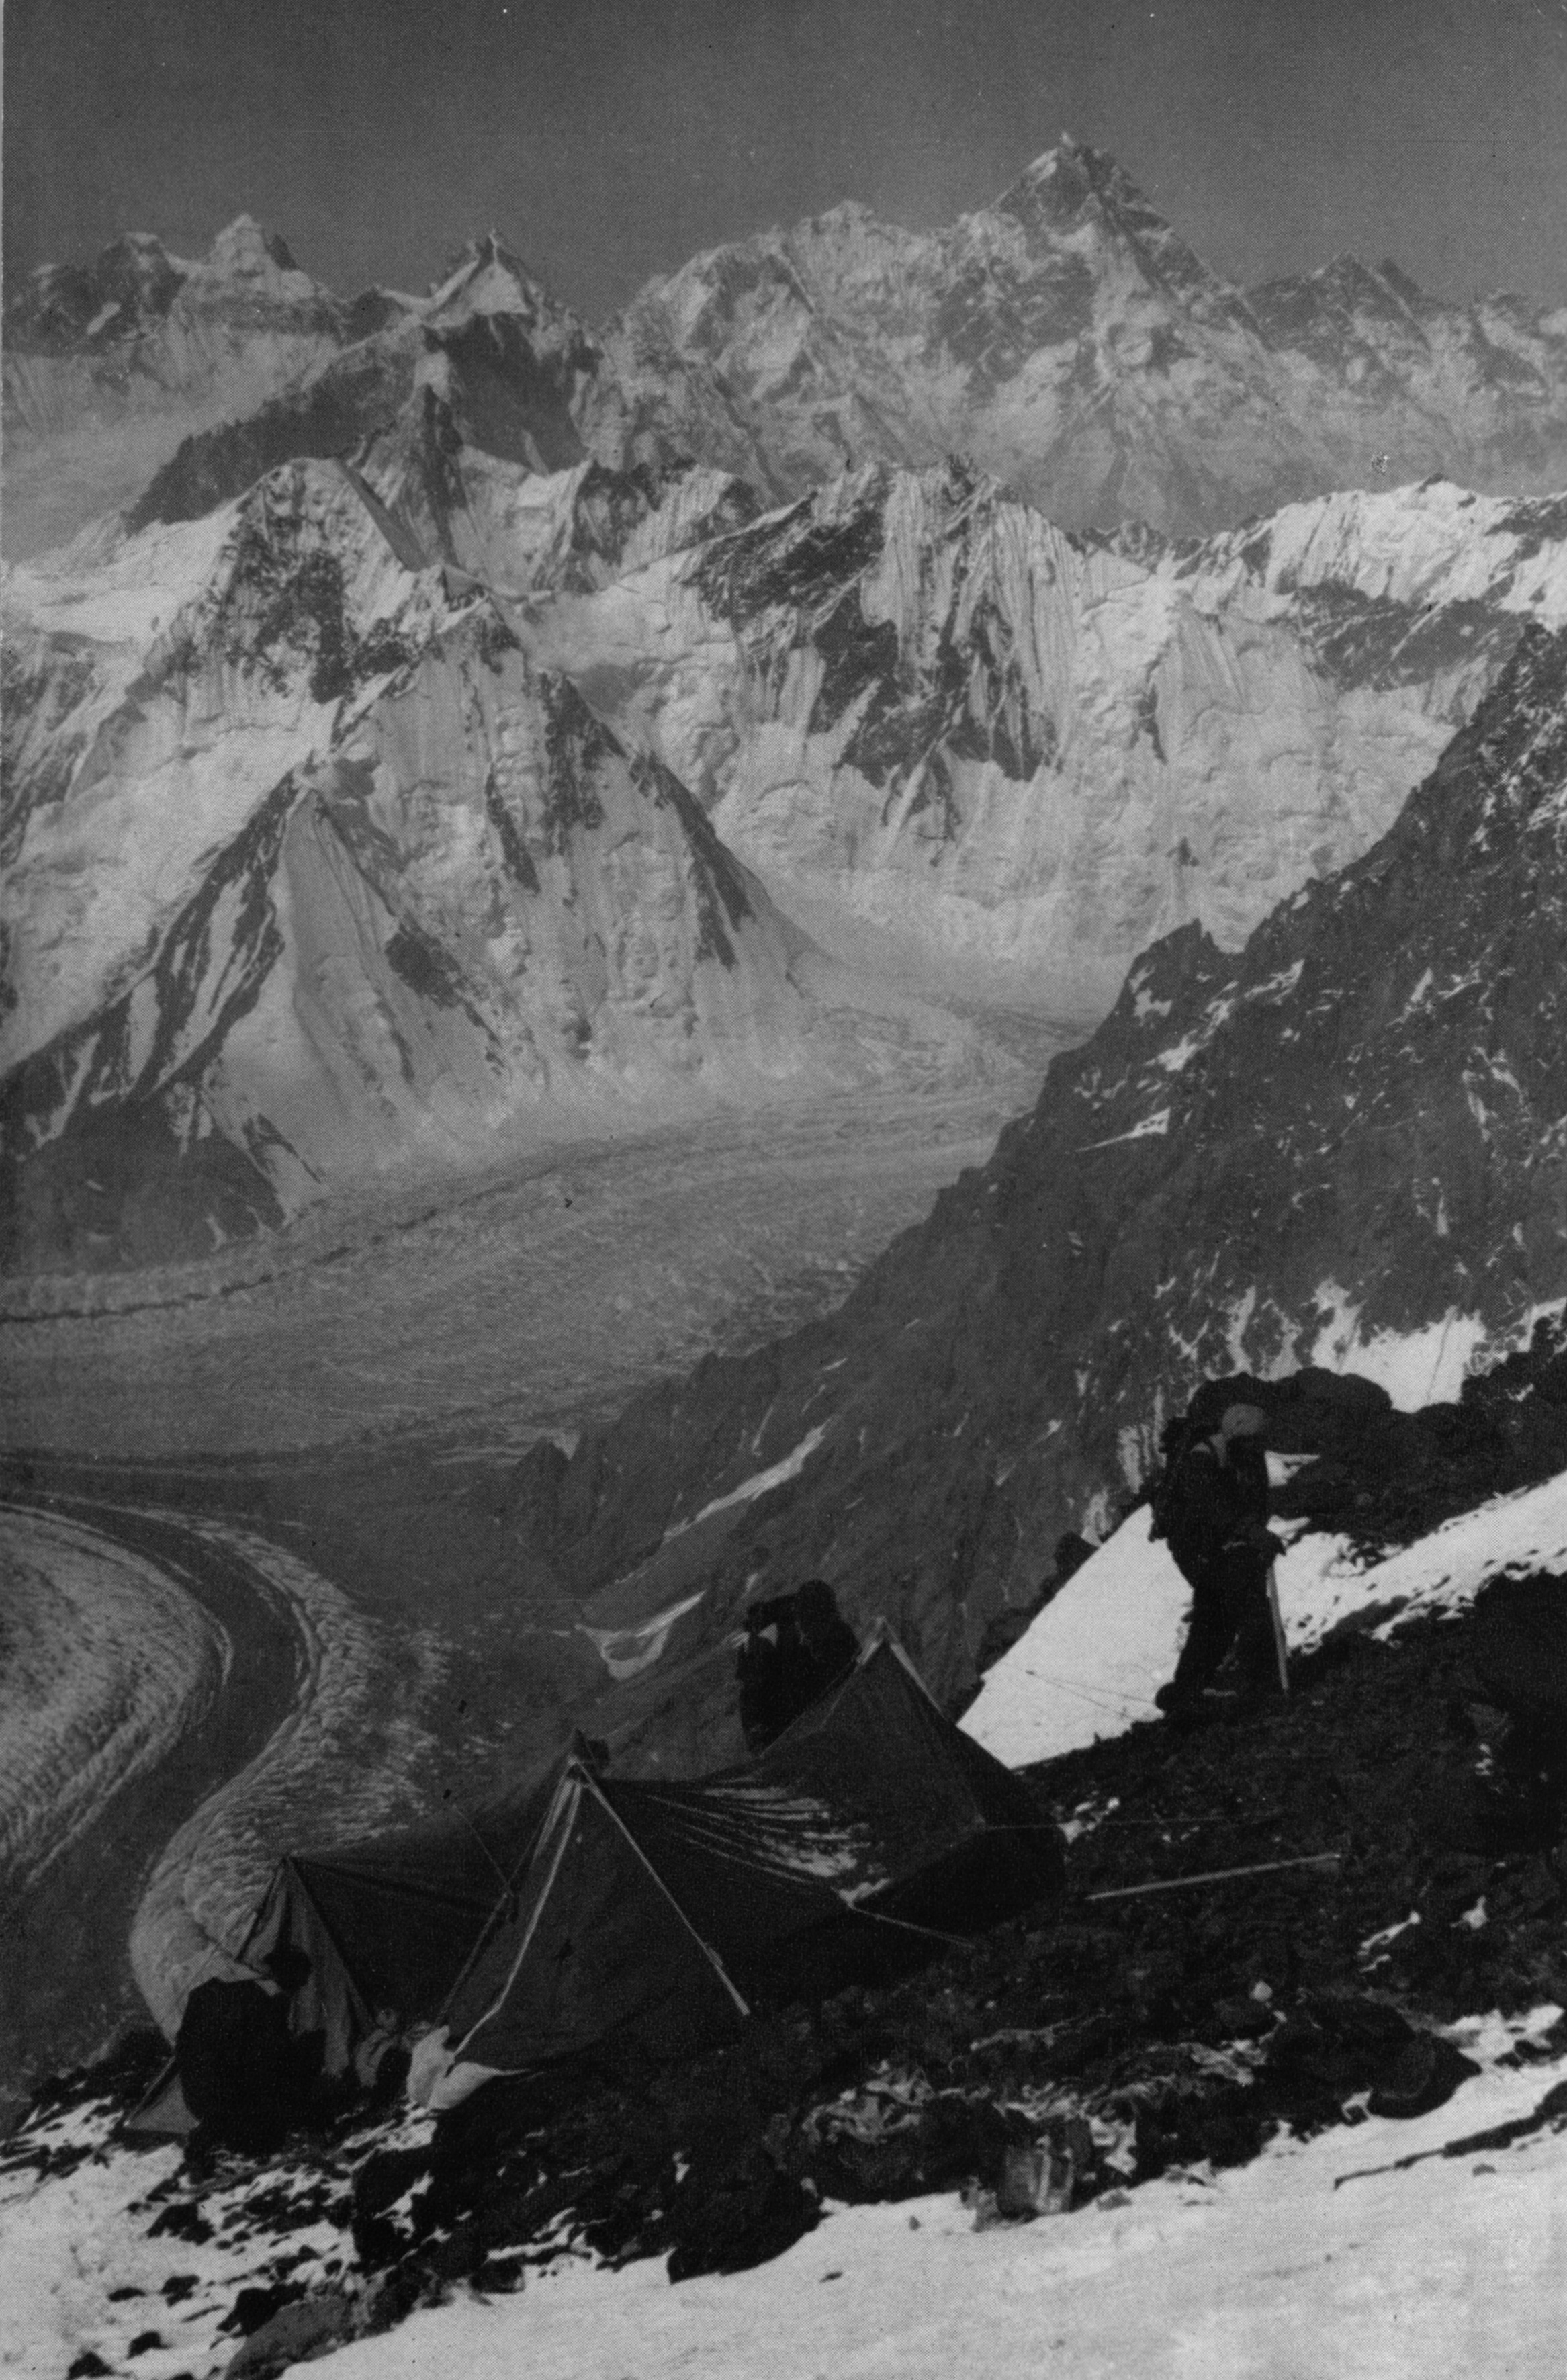 Camp V (22,000 ft.) with Mashrabrum [sic] in the background.  Photo, Third American Karakoram Expedition .